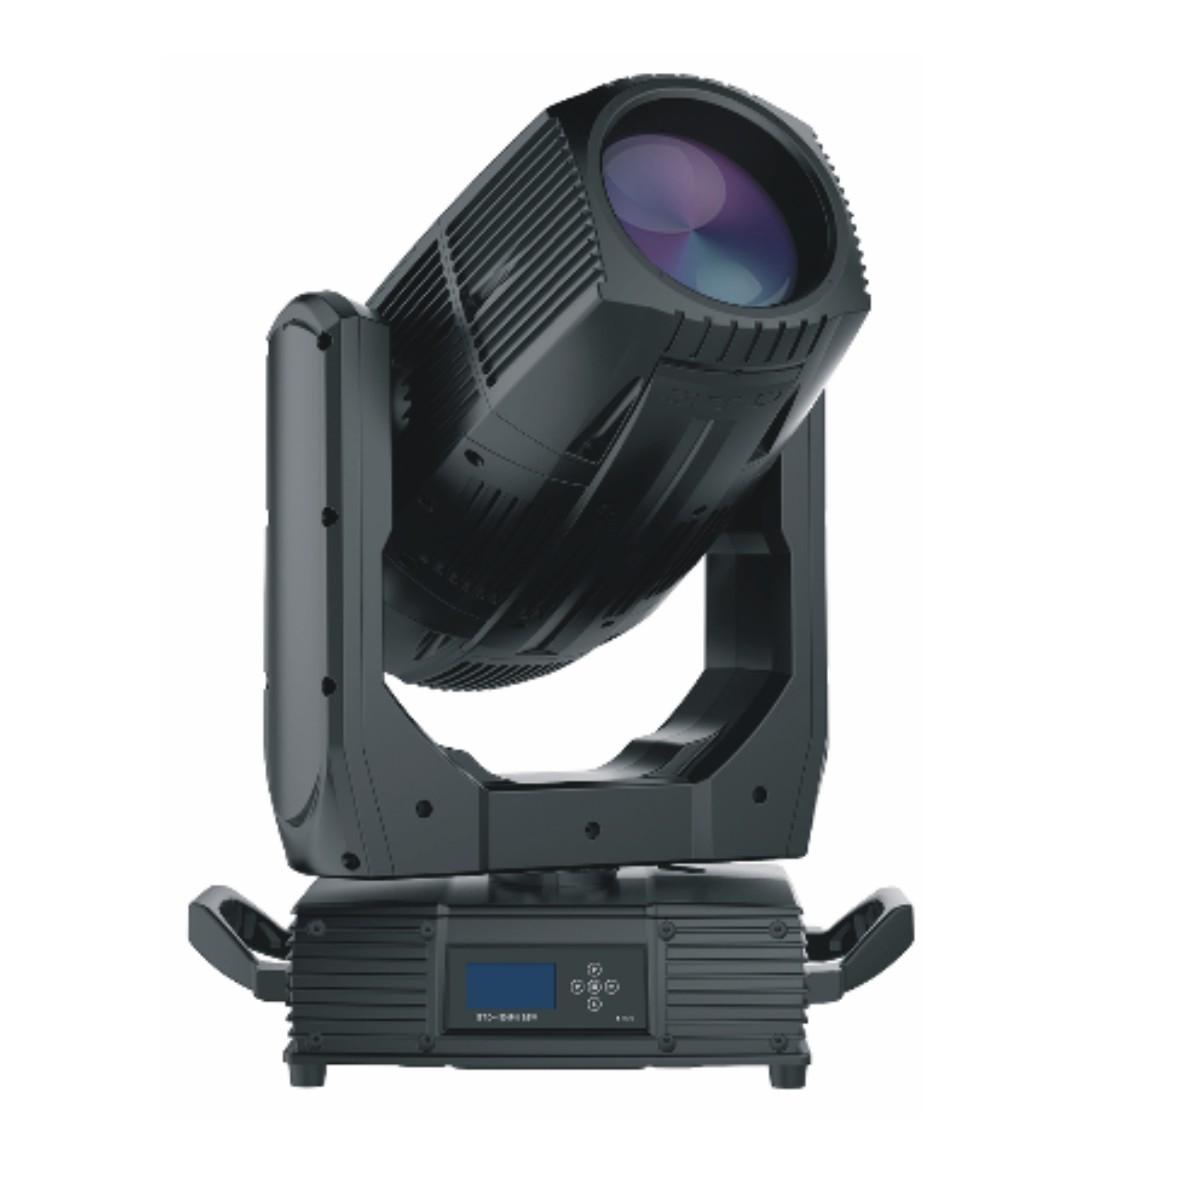 GTD-550P II BSW 防水电脑摇头灯(三合一)